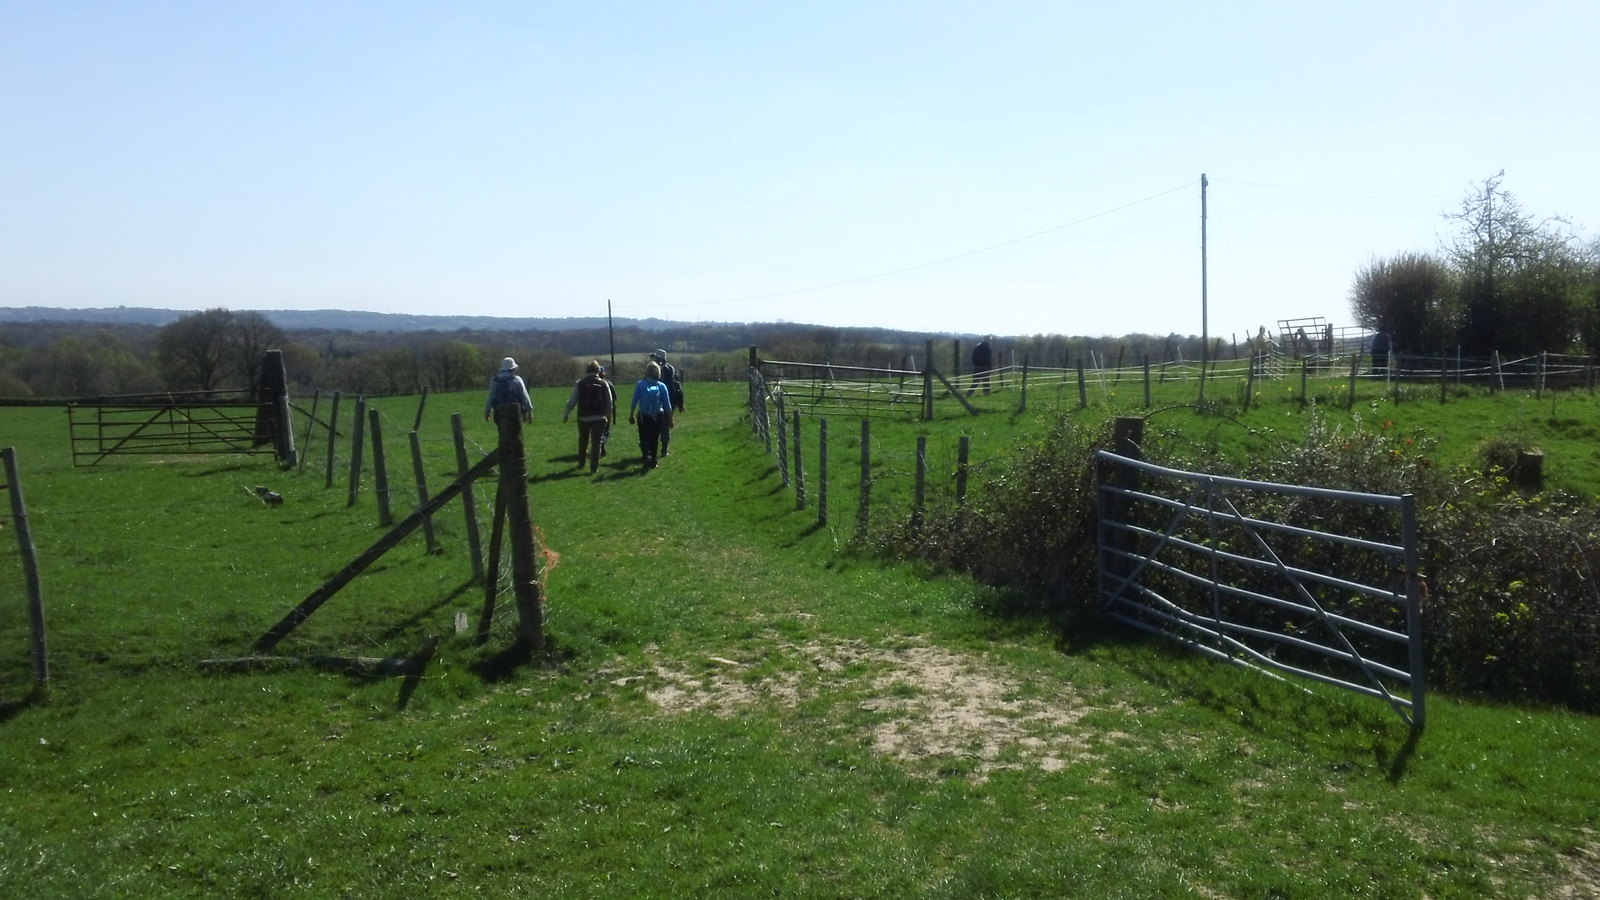 Onwards, southwards through a farm go Saturday Walkers on a mission